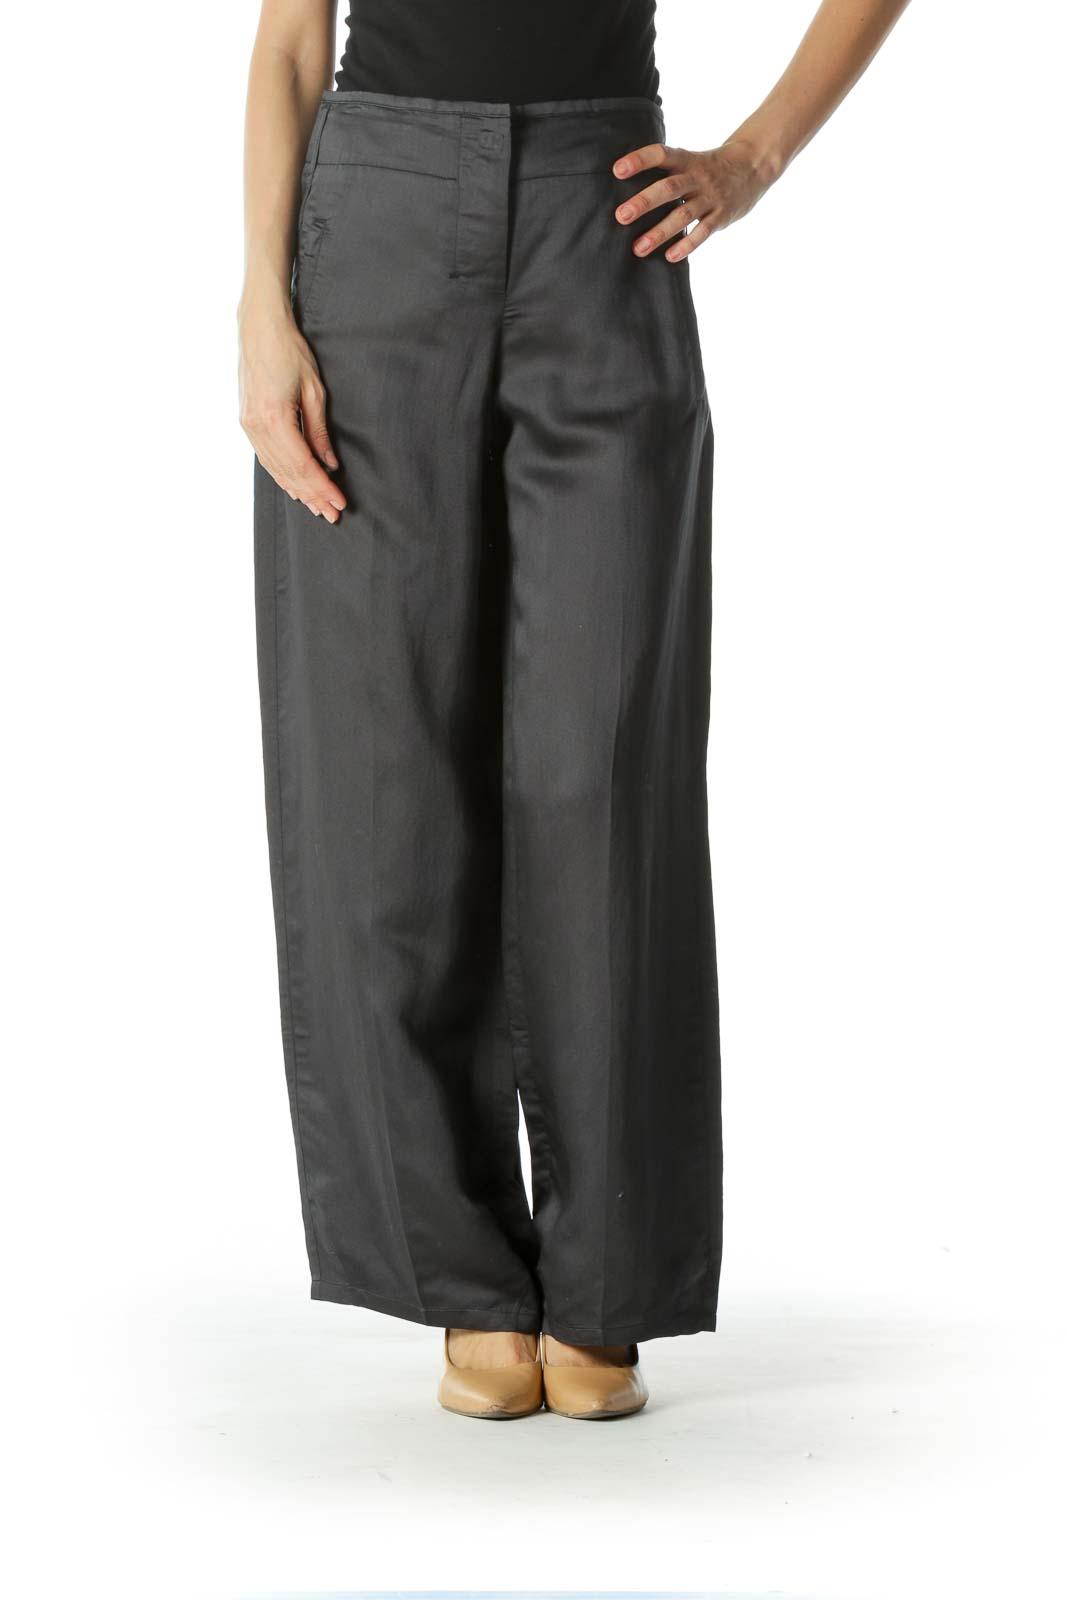 Gray Drawstring Waist Wide Leg Pants Front